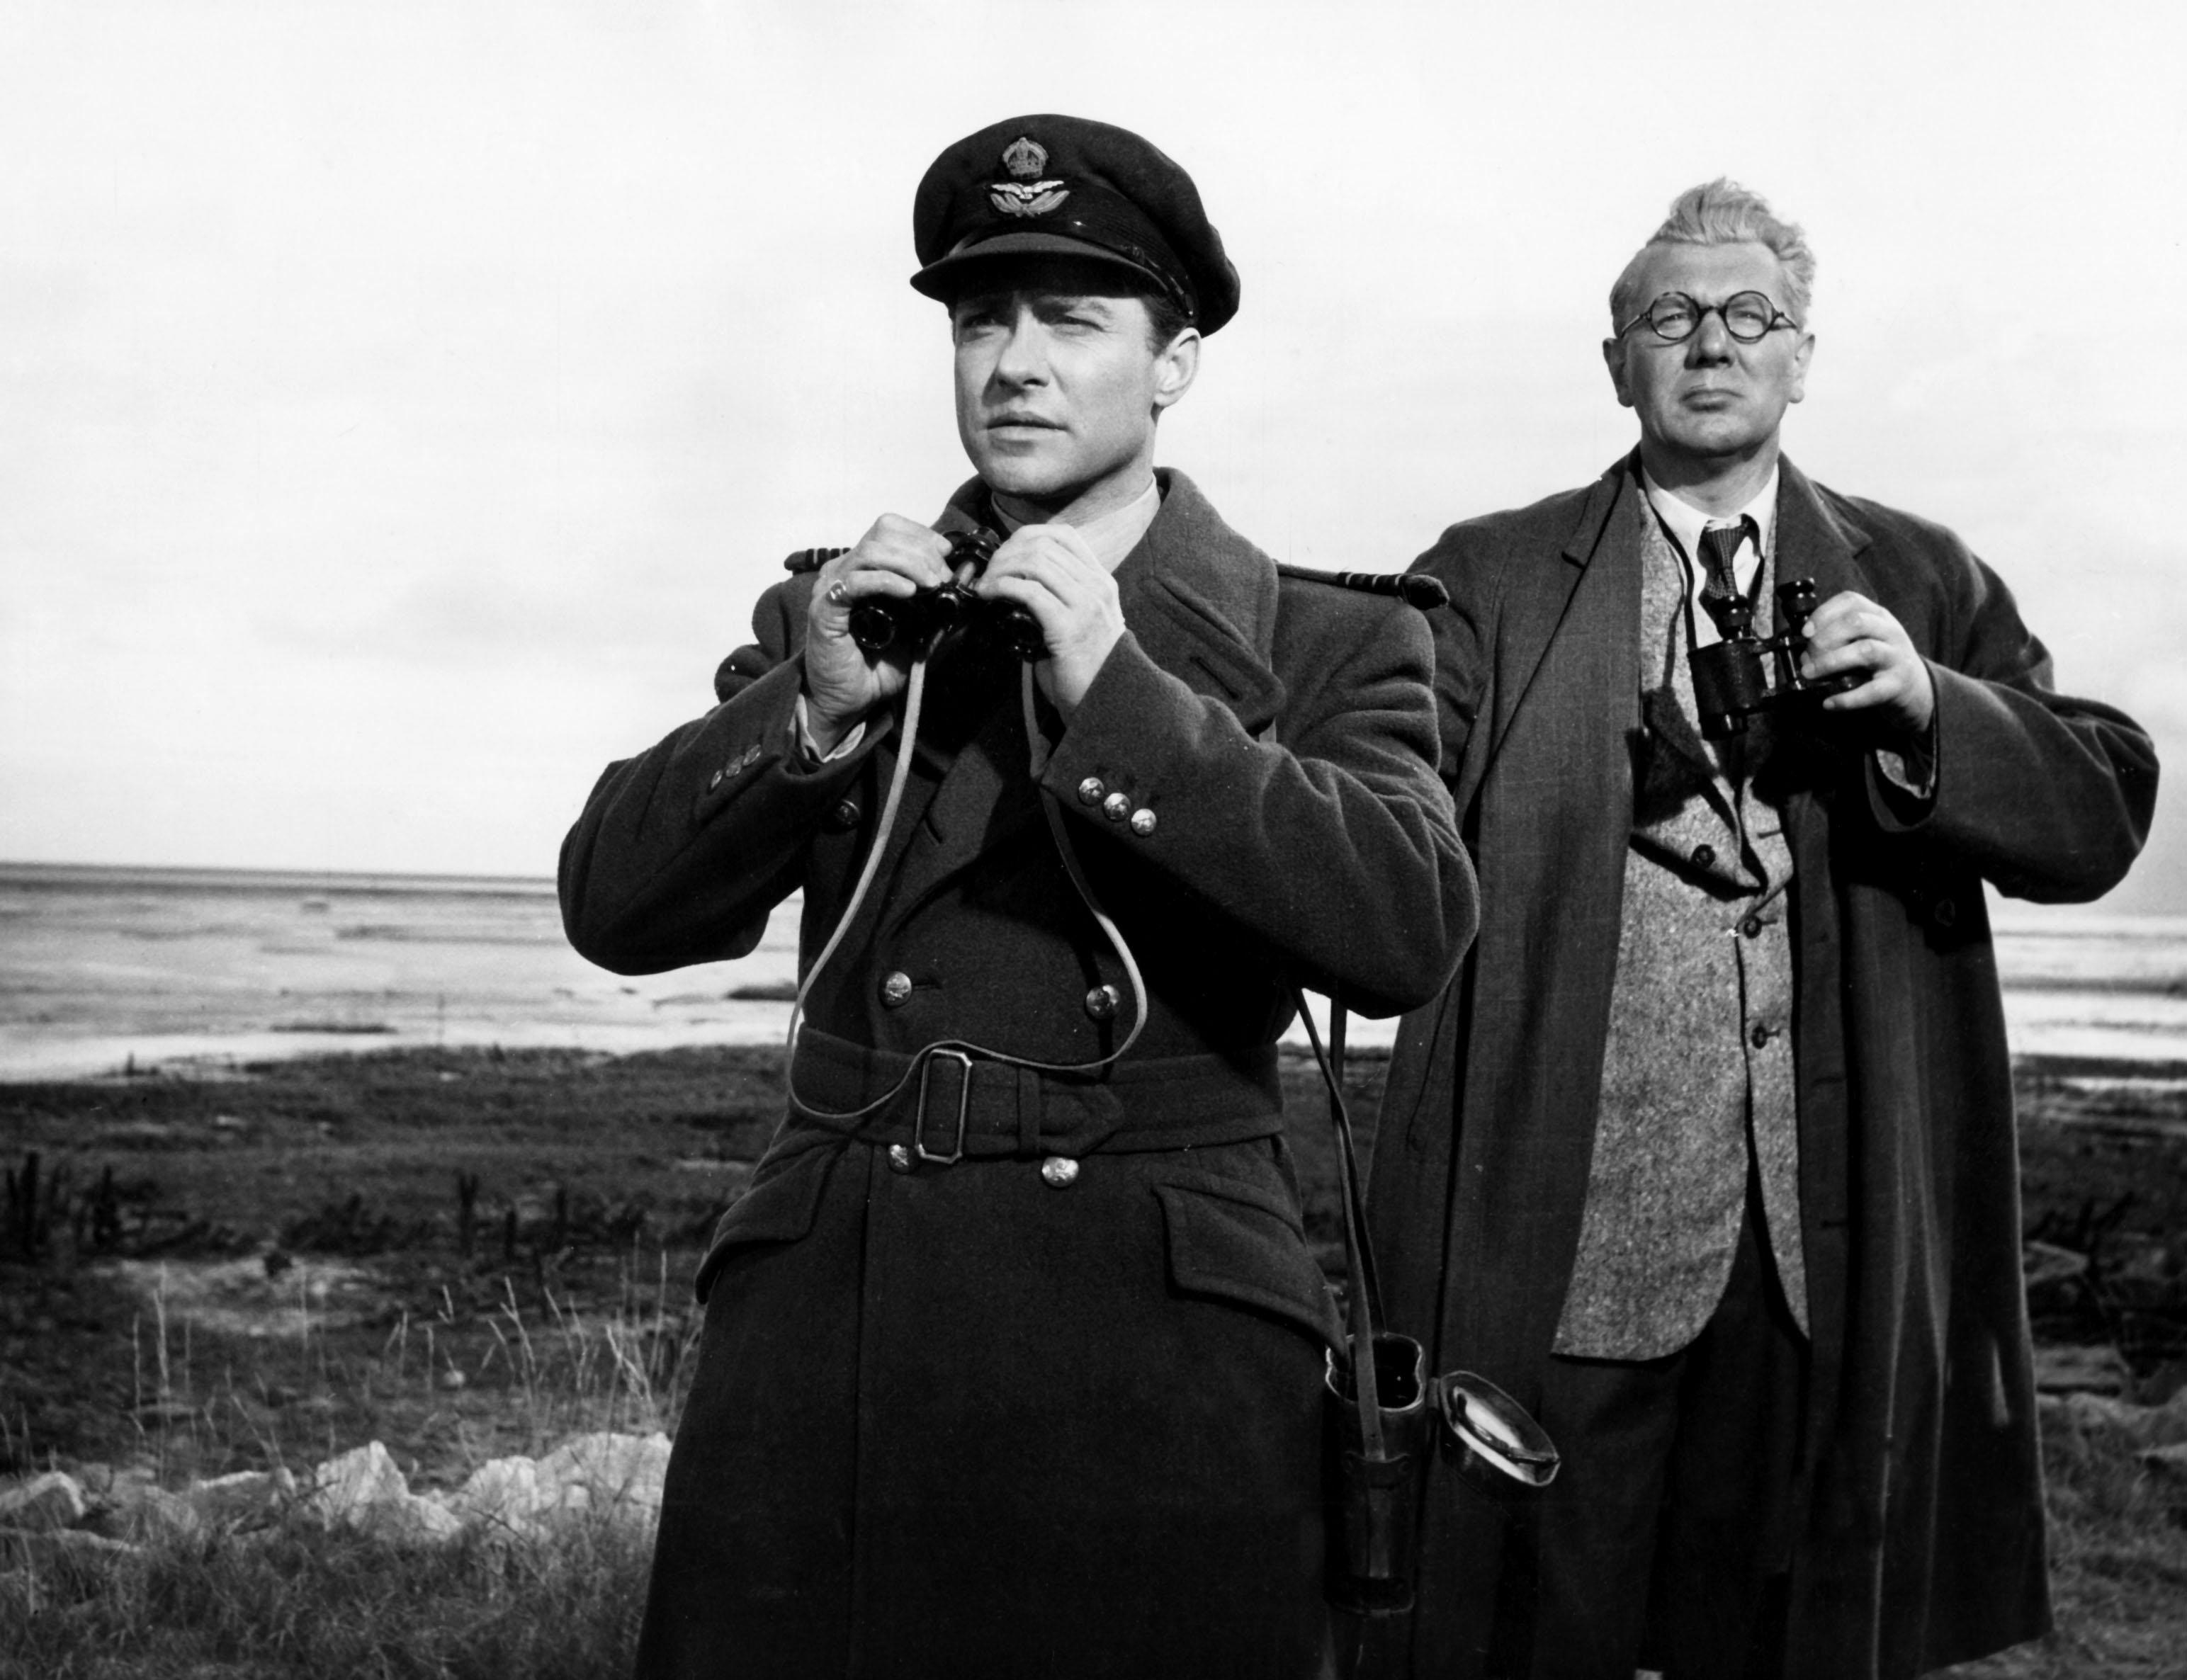 The 10 Best World War 2 Movies Ever Made